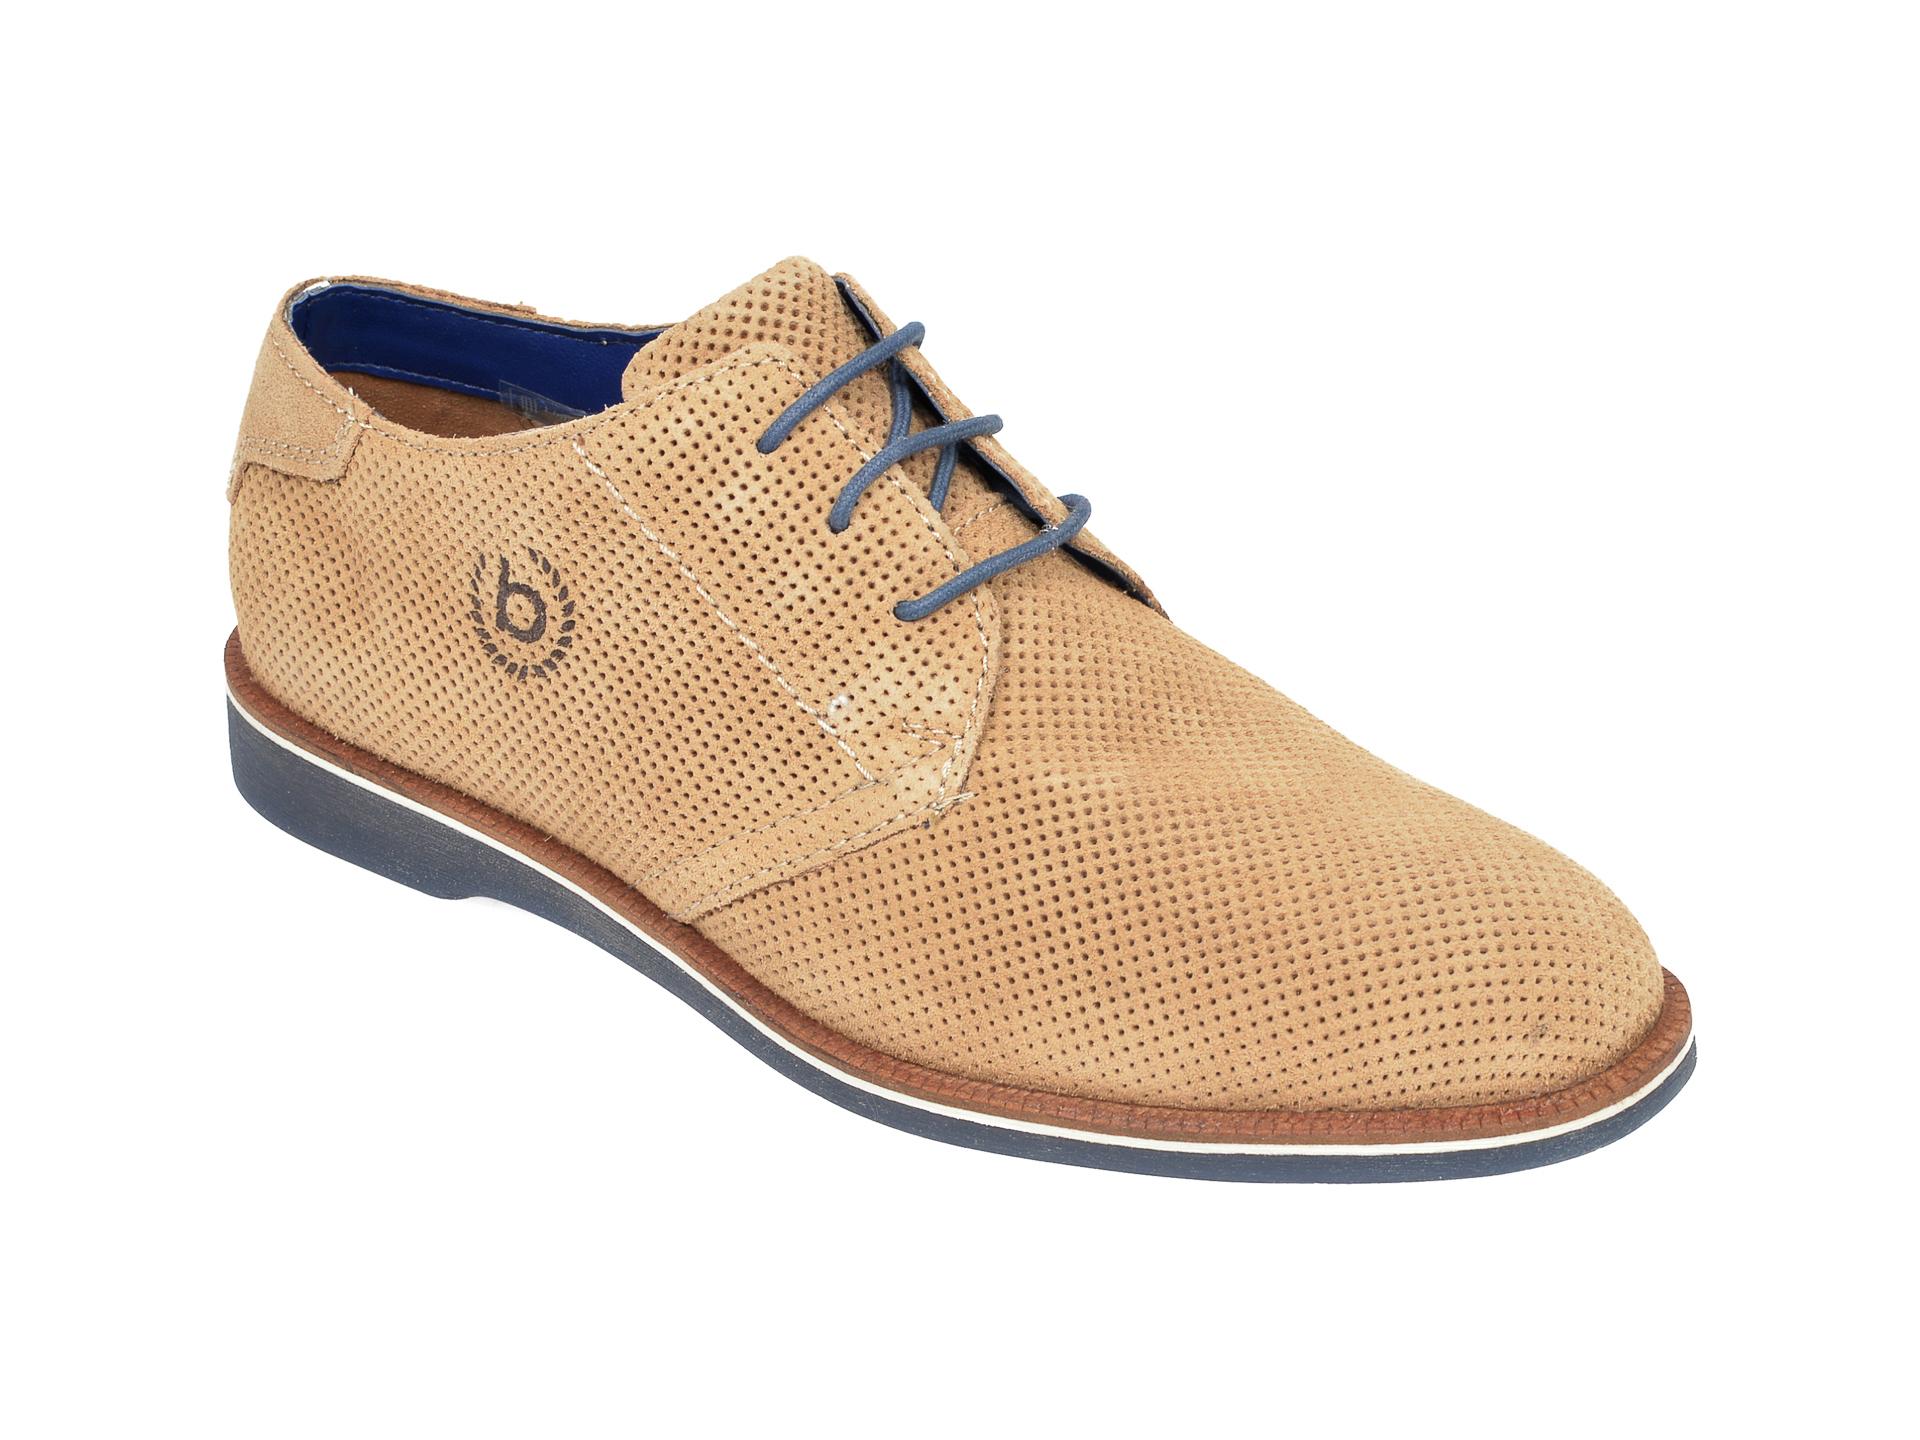 Pantofi BUGATTI maro, 64706, din piele intoarsa imagine